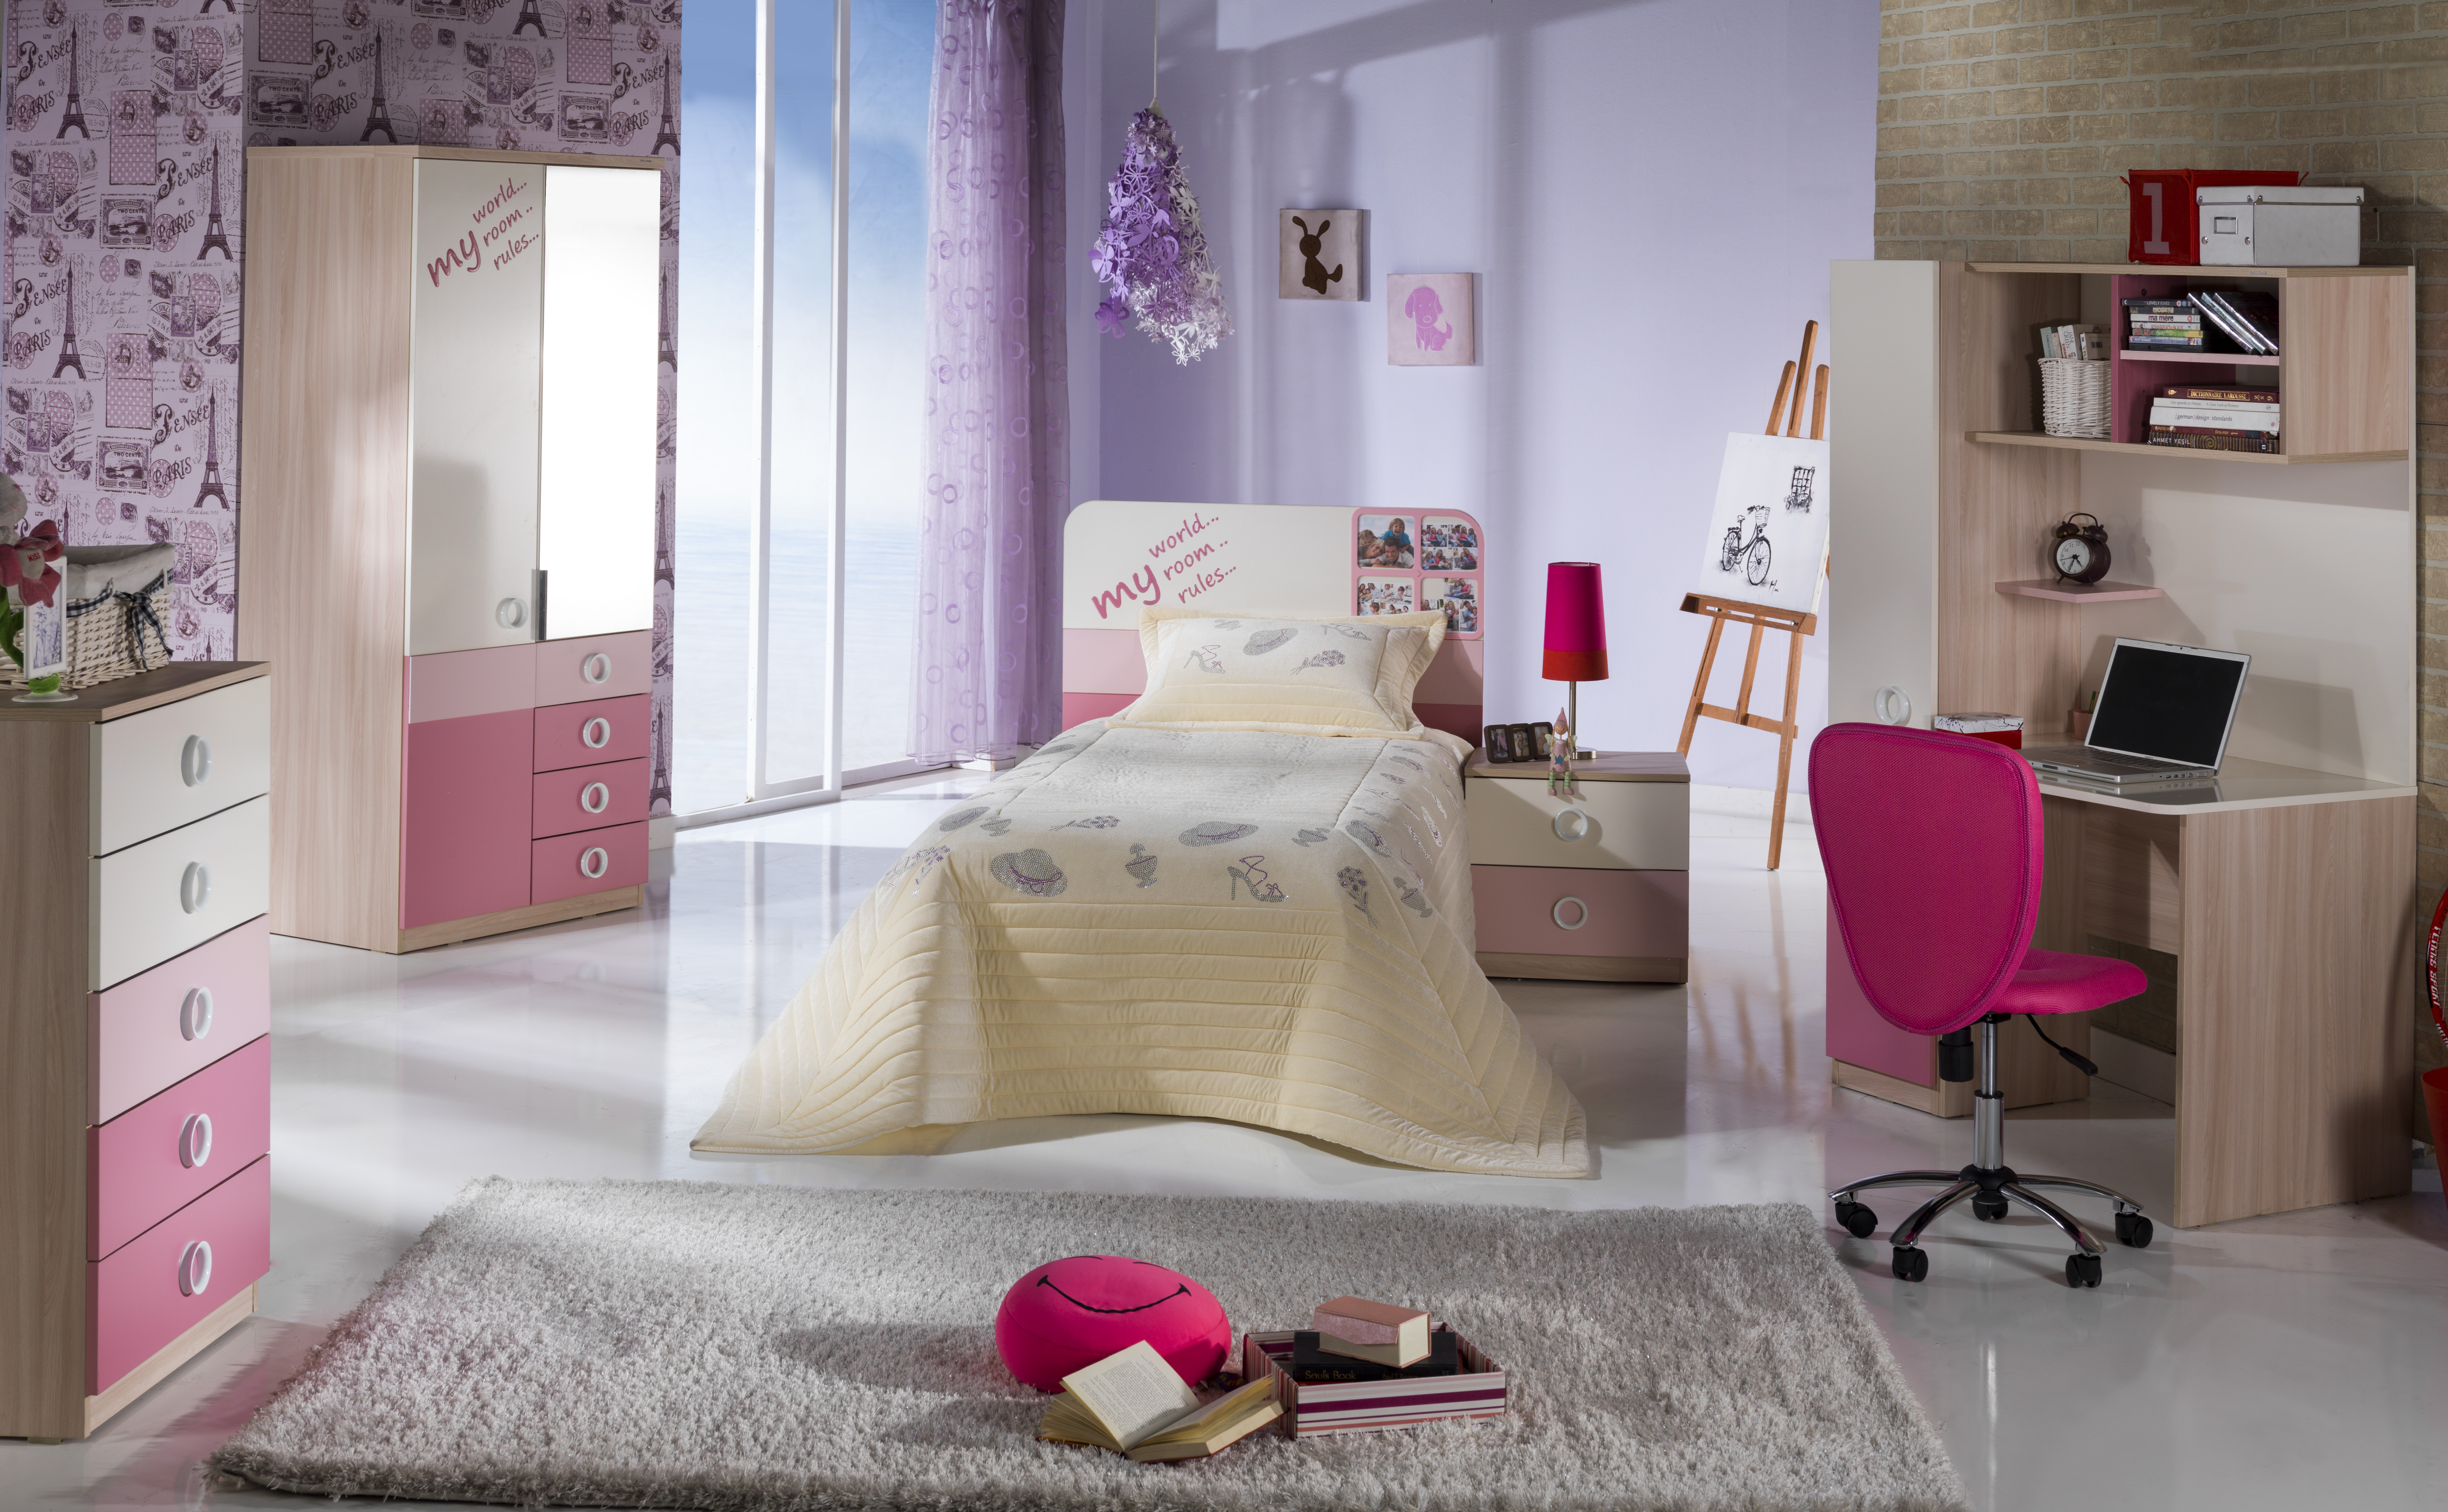 Portivo chambre enfant-5